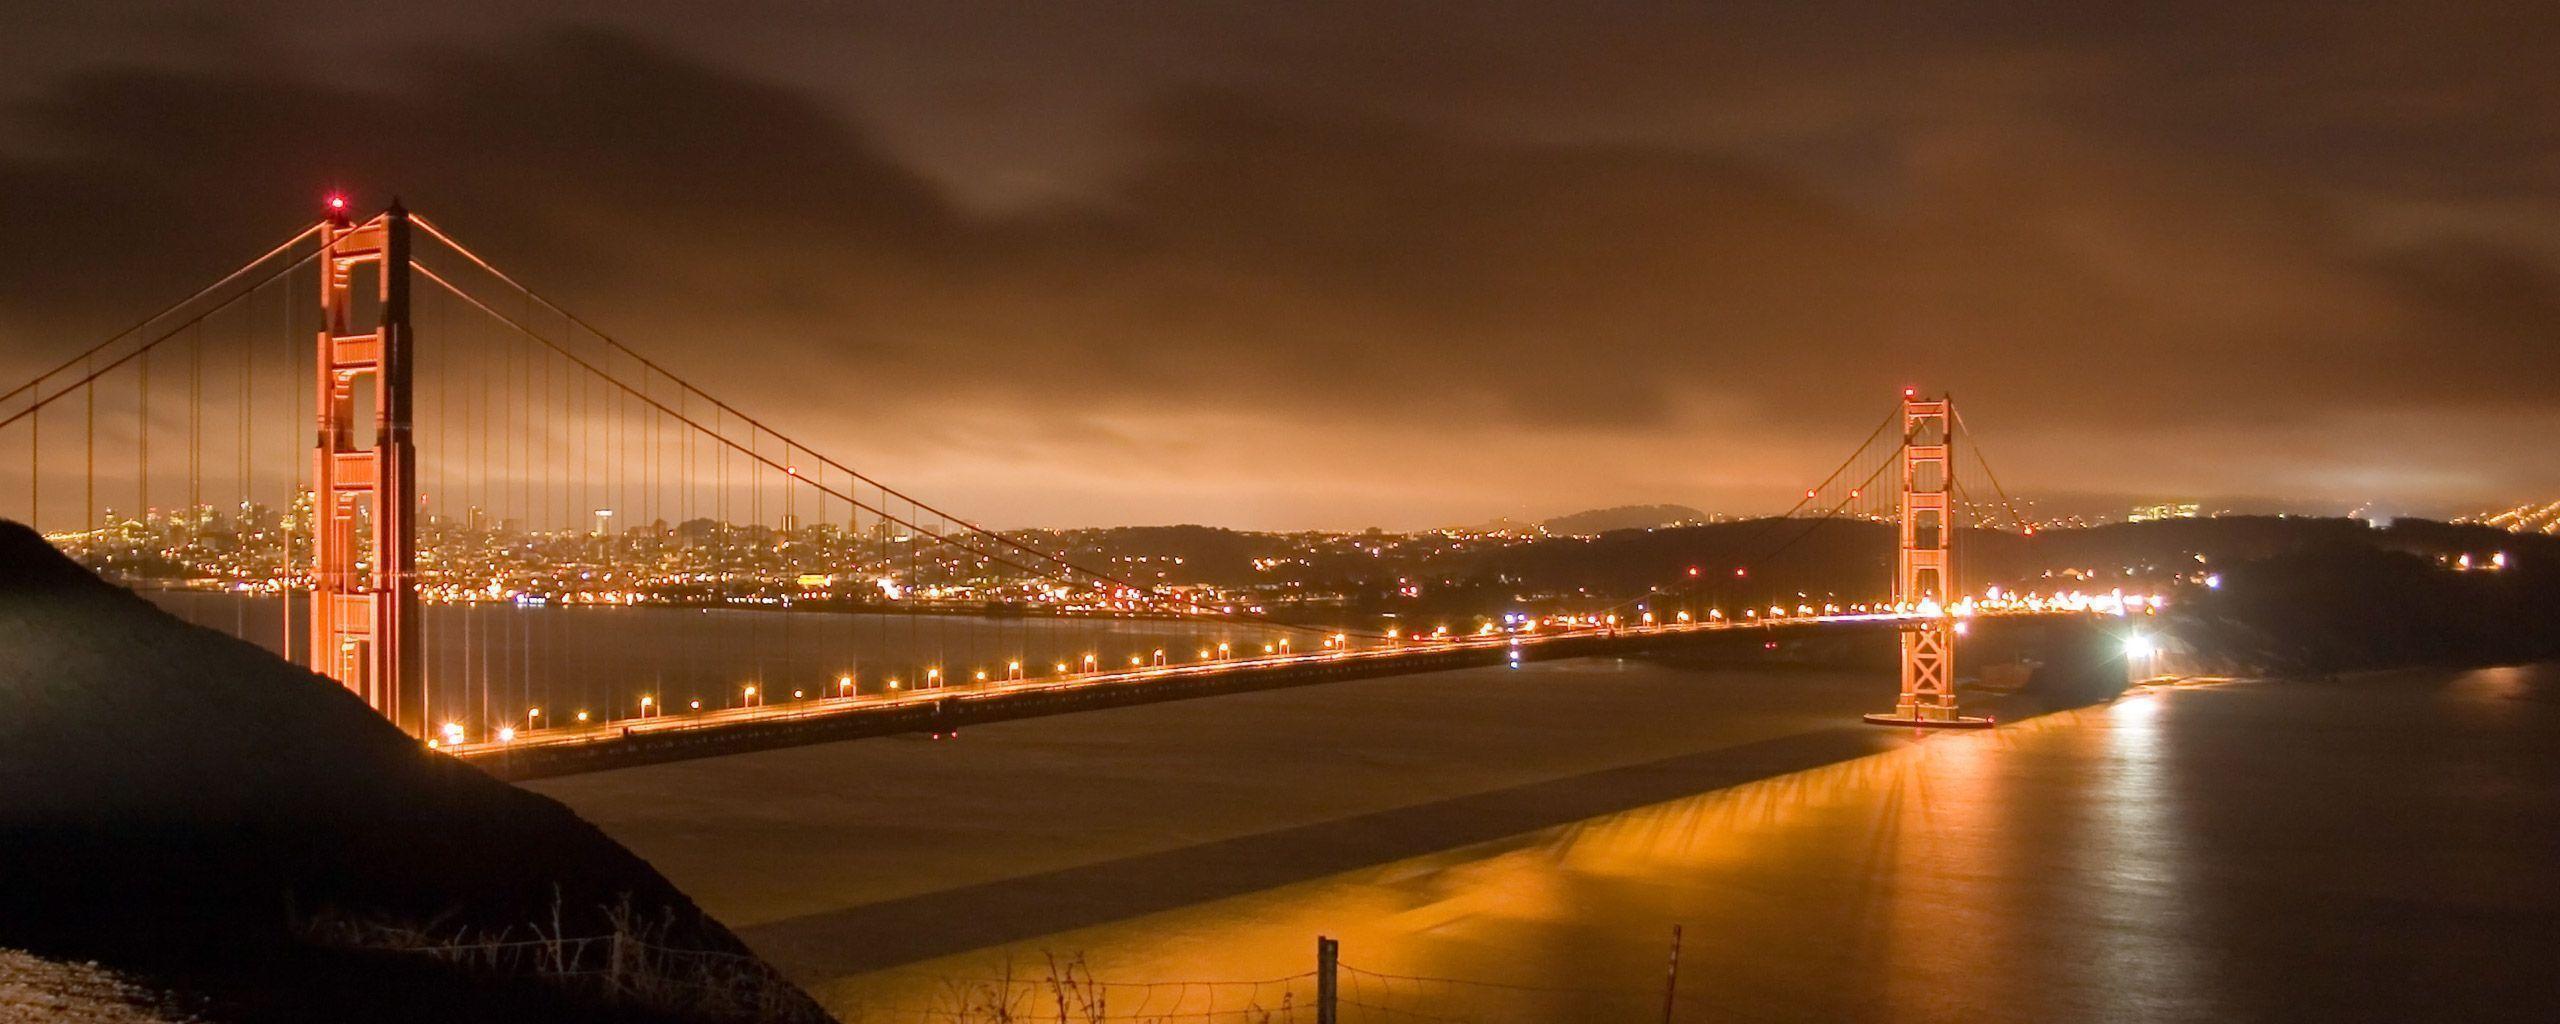 Golden Gate Bridge Wallpaper - Viewing Gallery